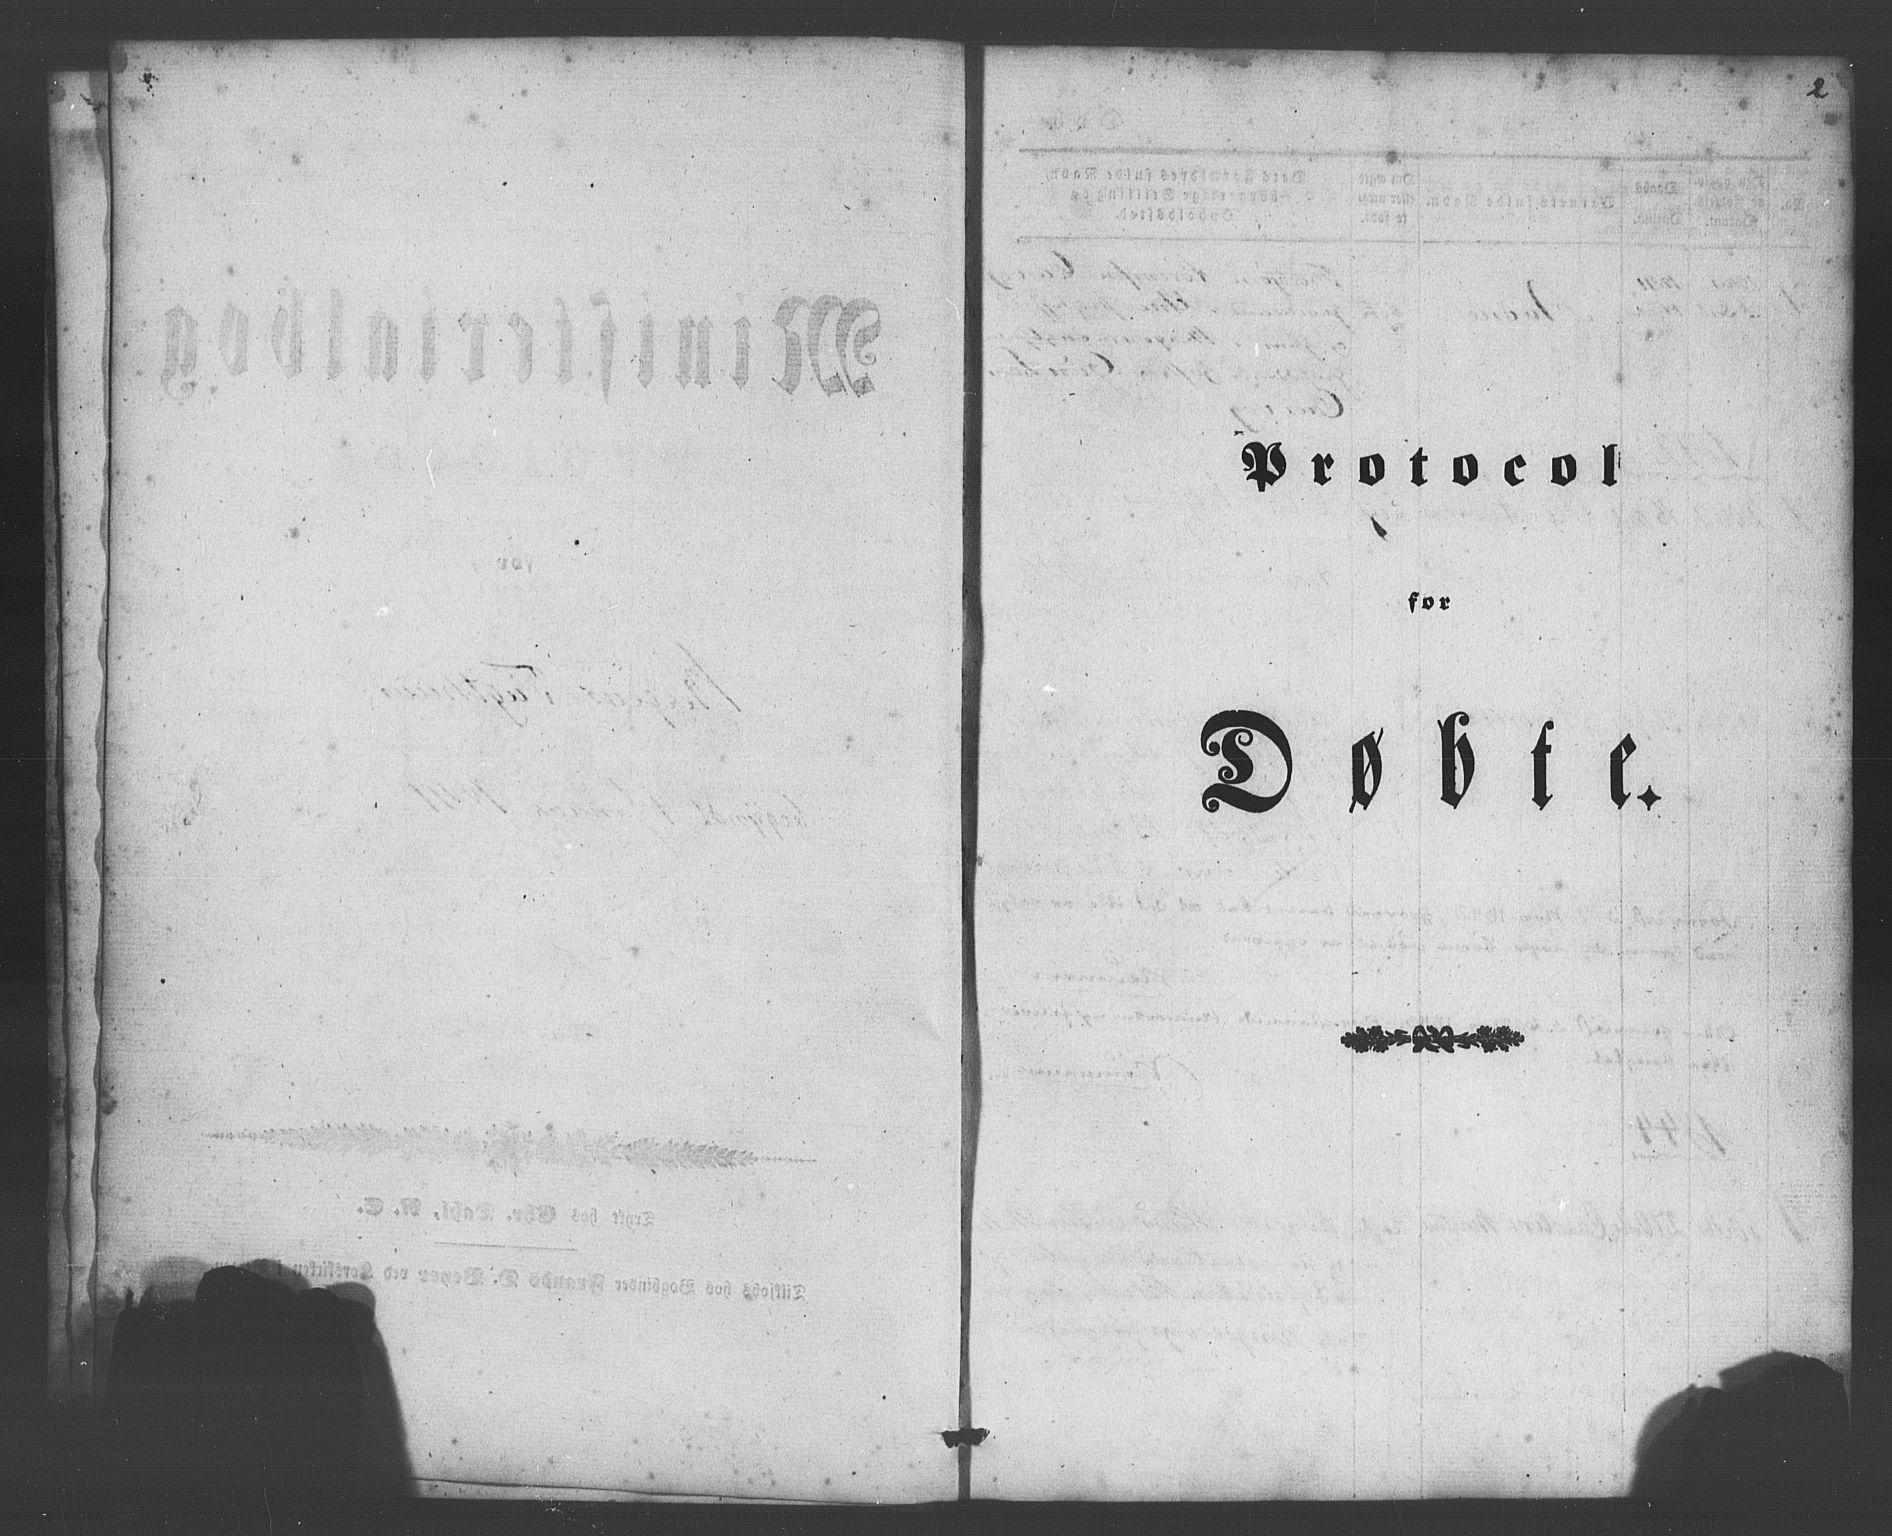 SAB, Bergens strafanstalts sokneprestembete*, Ministerialbok nr. A 1, 1841-1884, s. 2